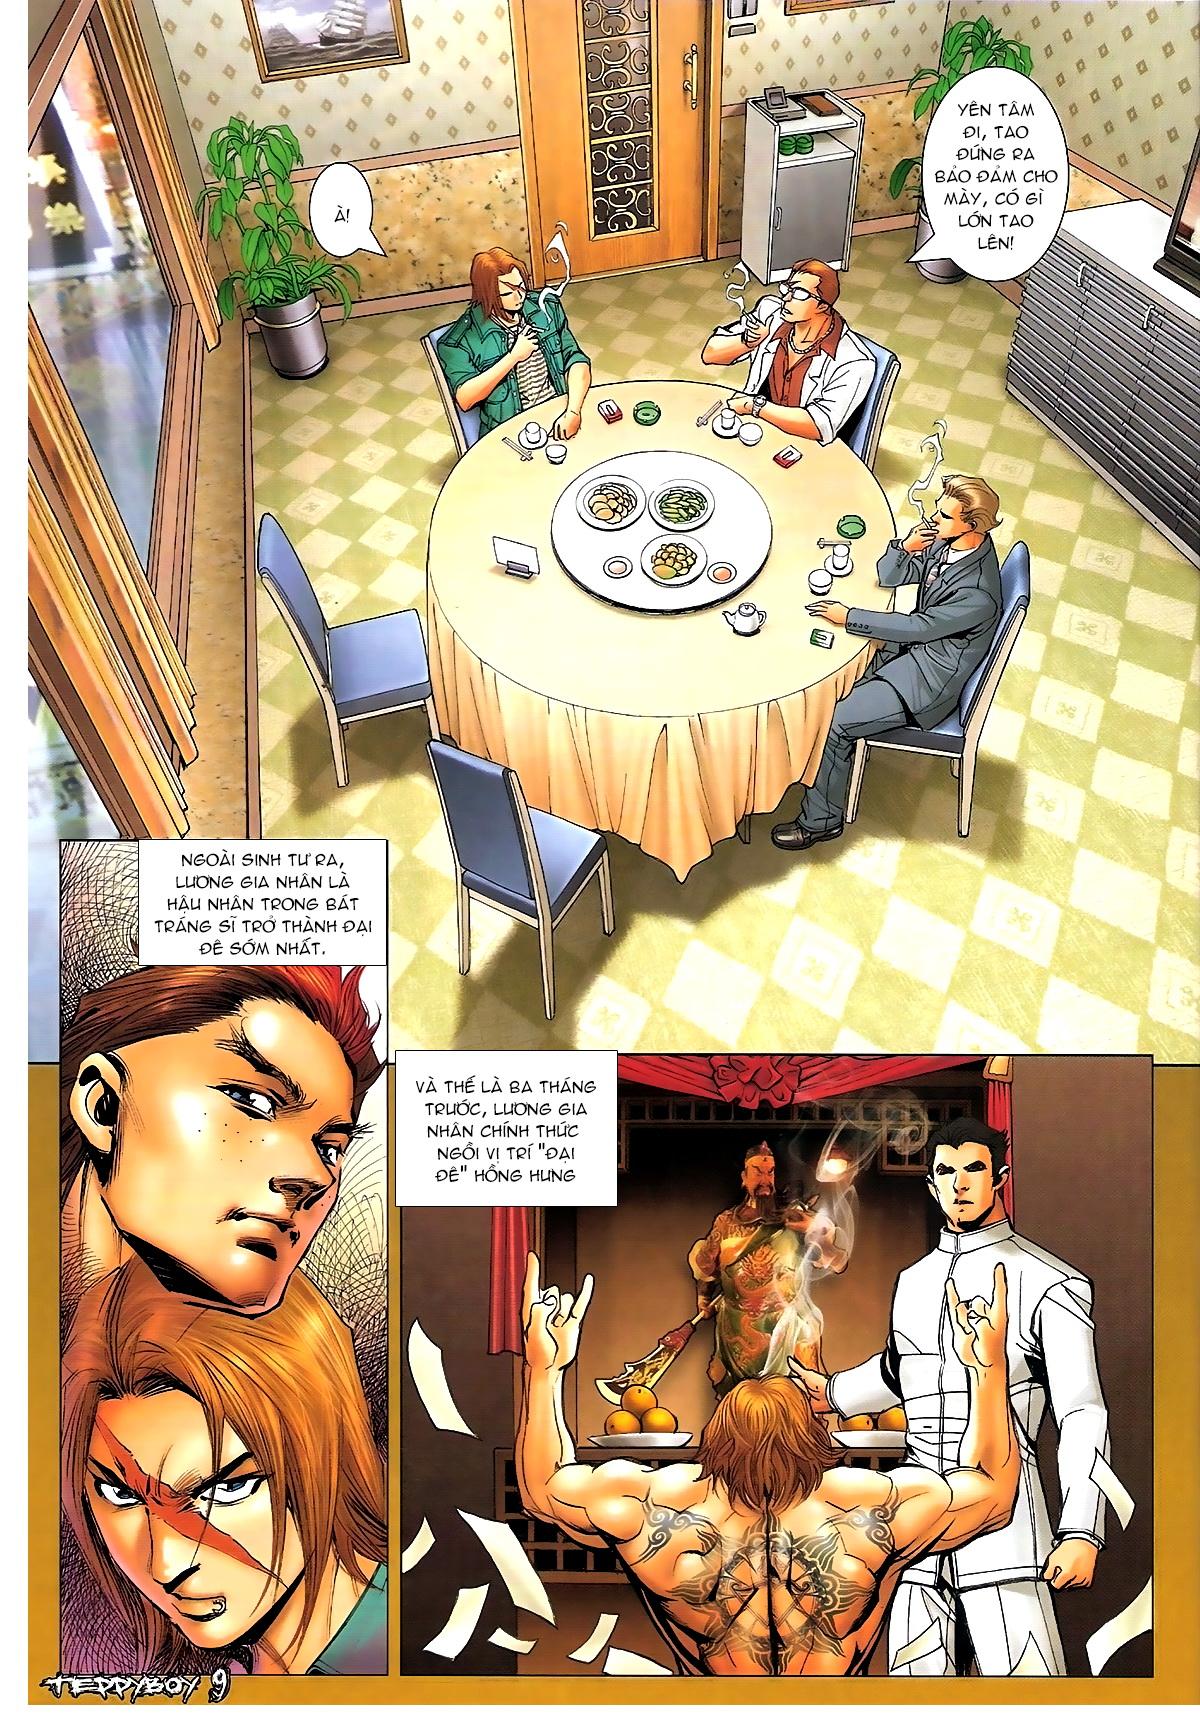 Người Trong Giang Hồ - Chapter 1324: Cừ có hơn tao - Pic 8